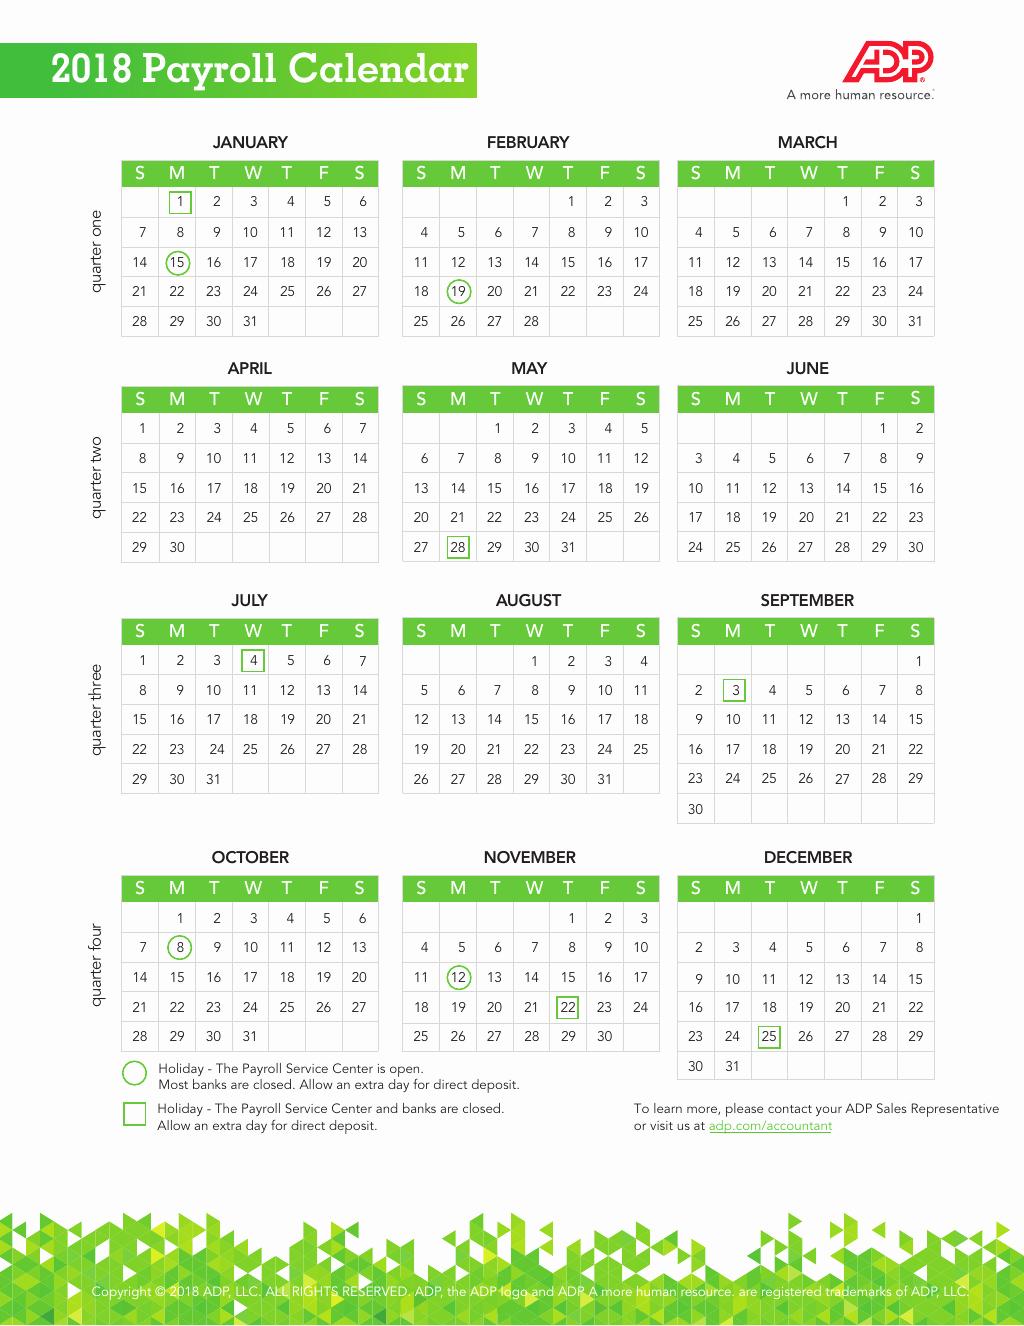 2019 Biweekly Payroll Calendar Template Beautiful 2018 Payroll Calendar Adp